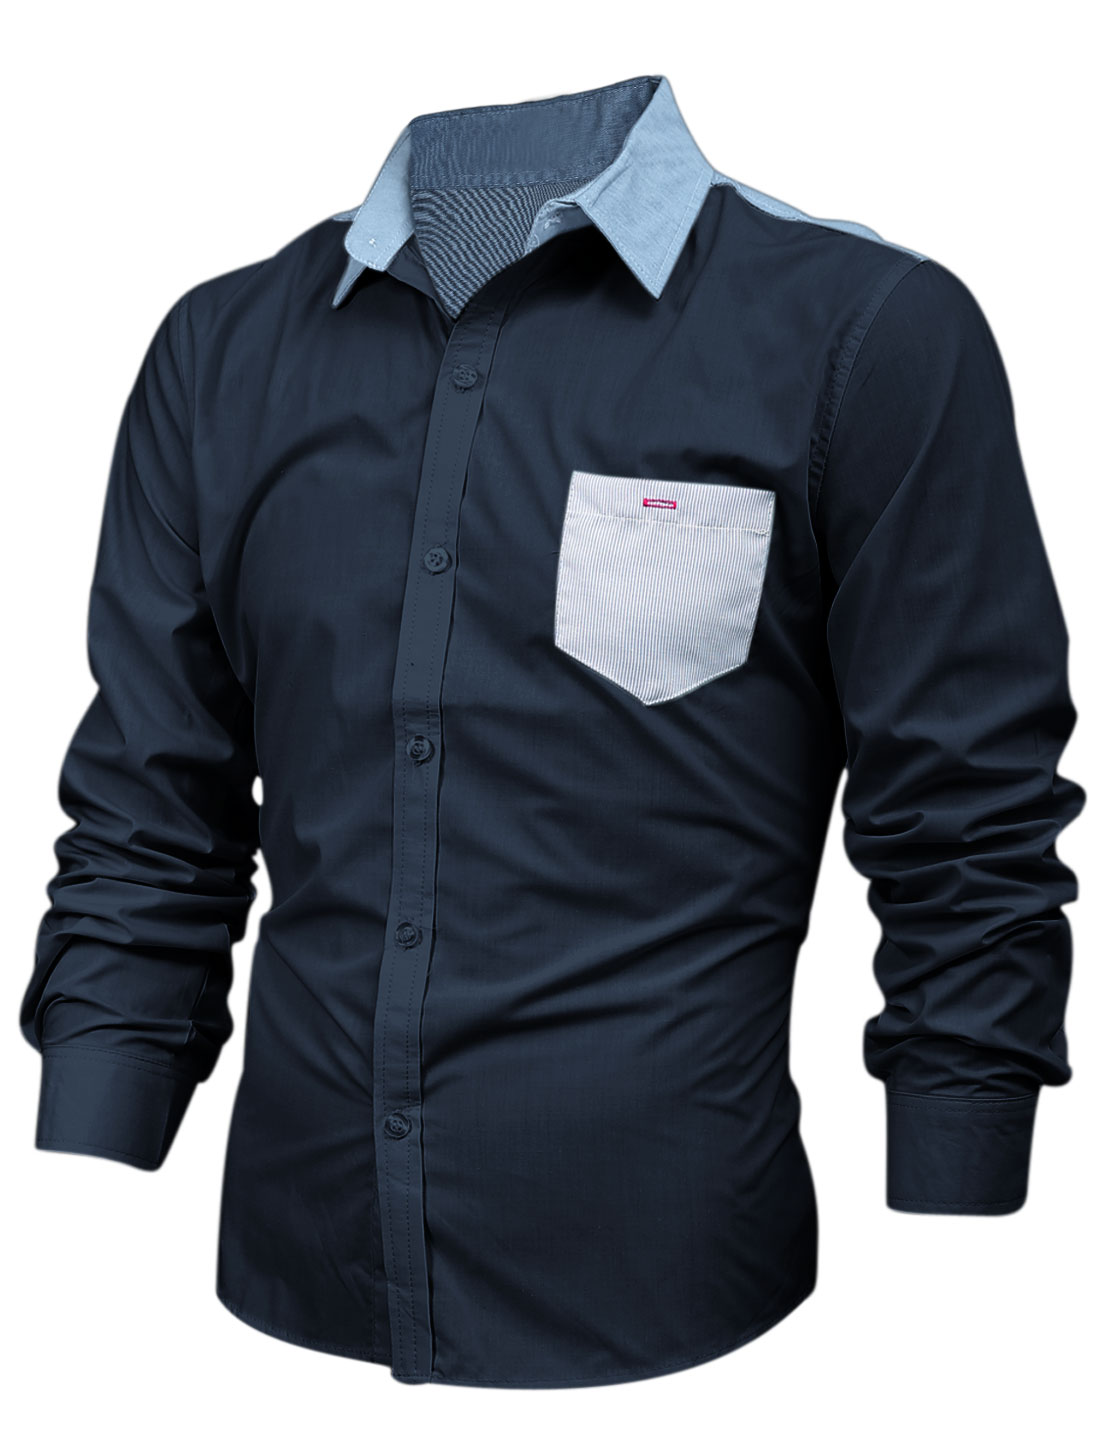 Men Splicing Button Closure Front Point Collar Casual Shirt Navy Blue M